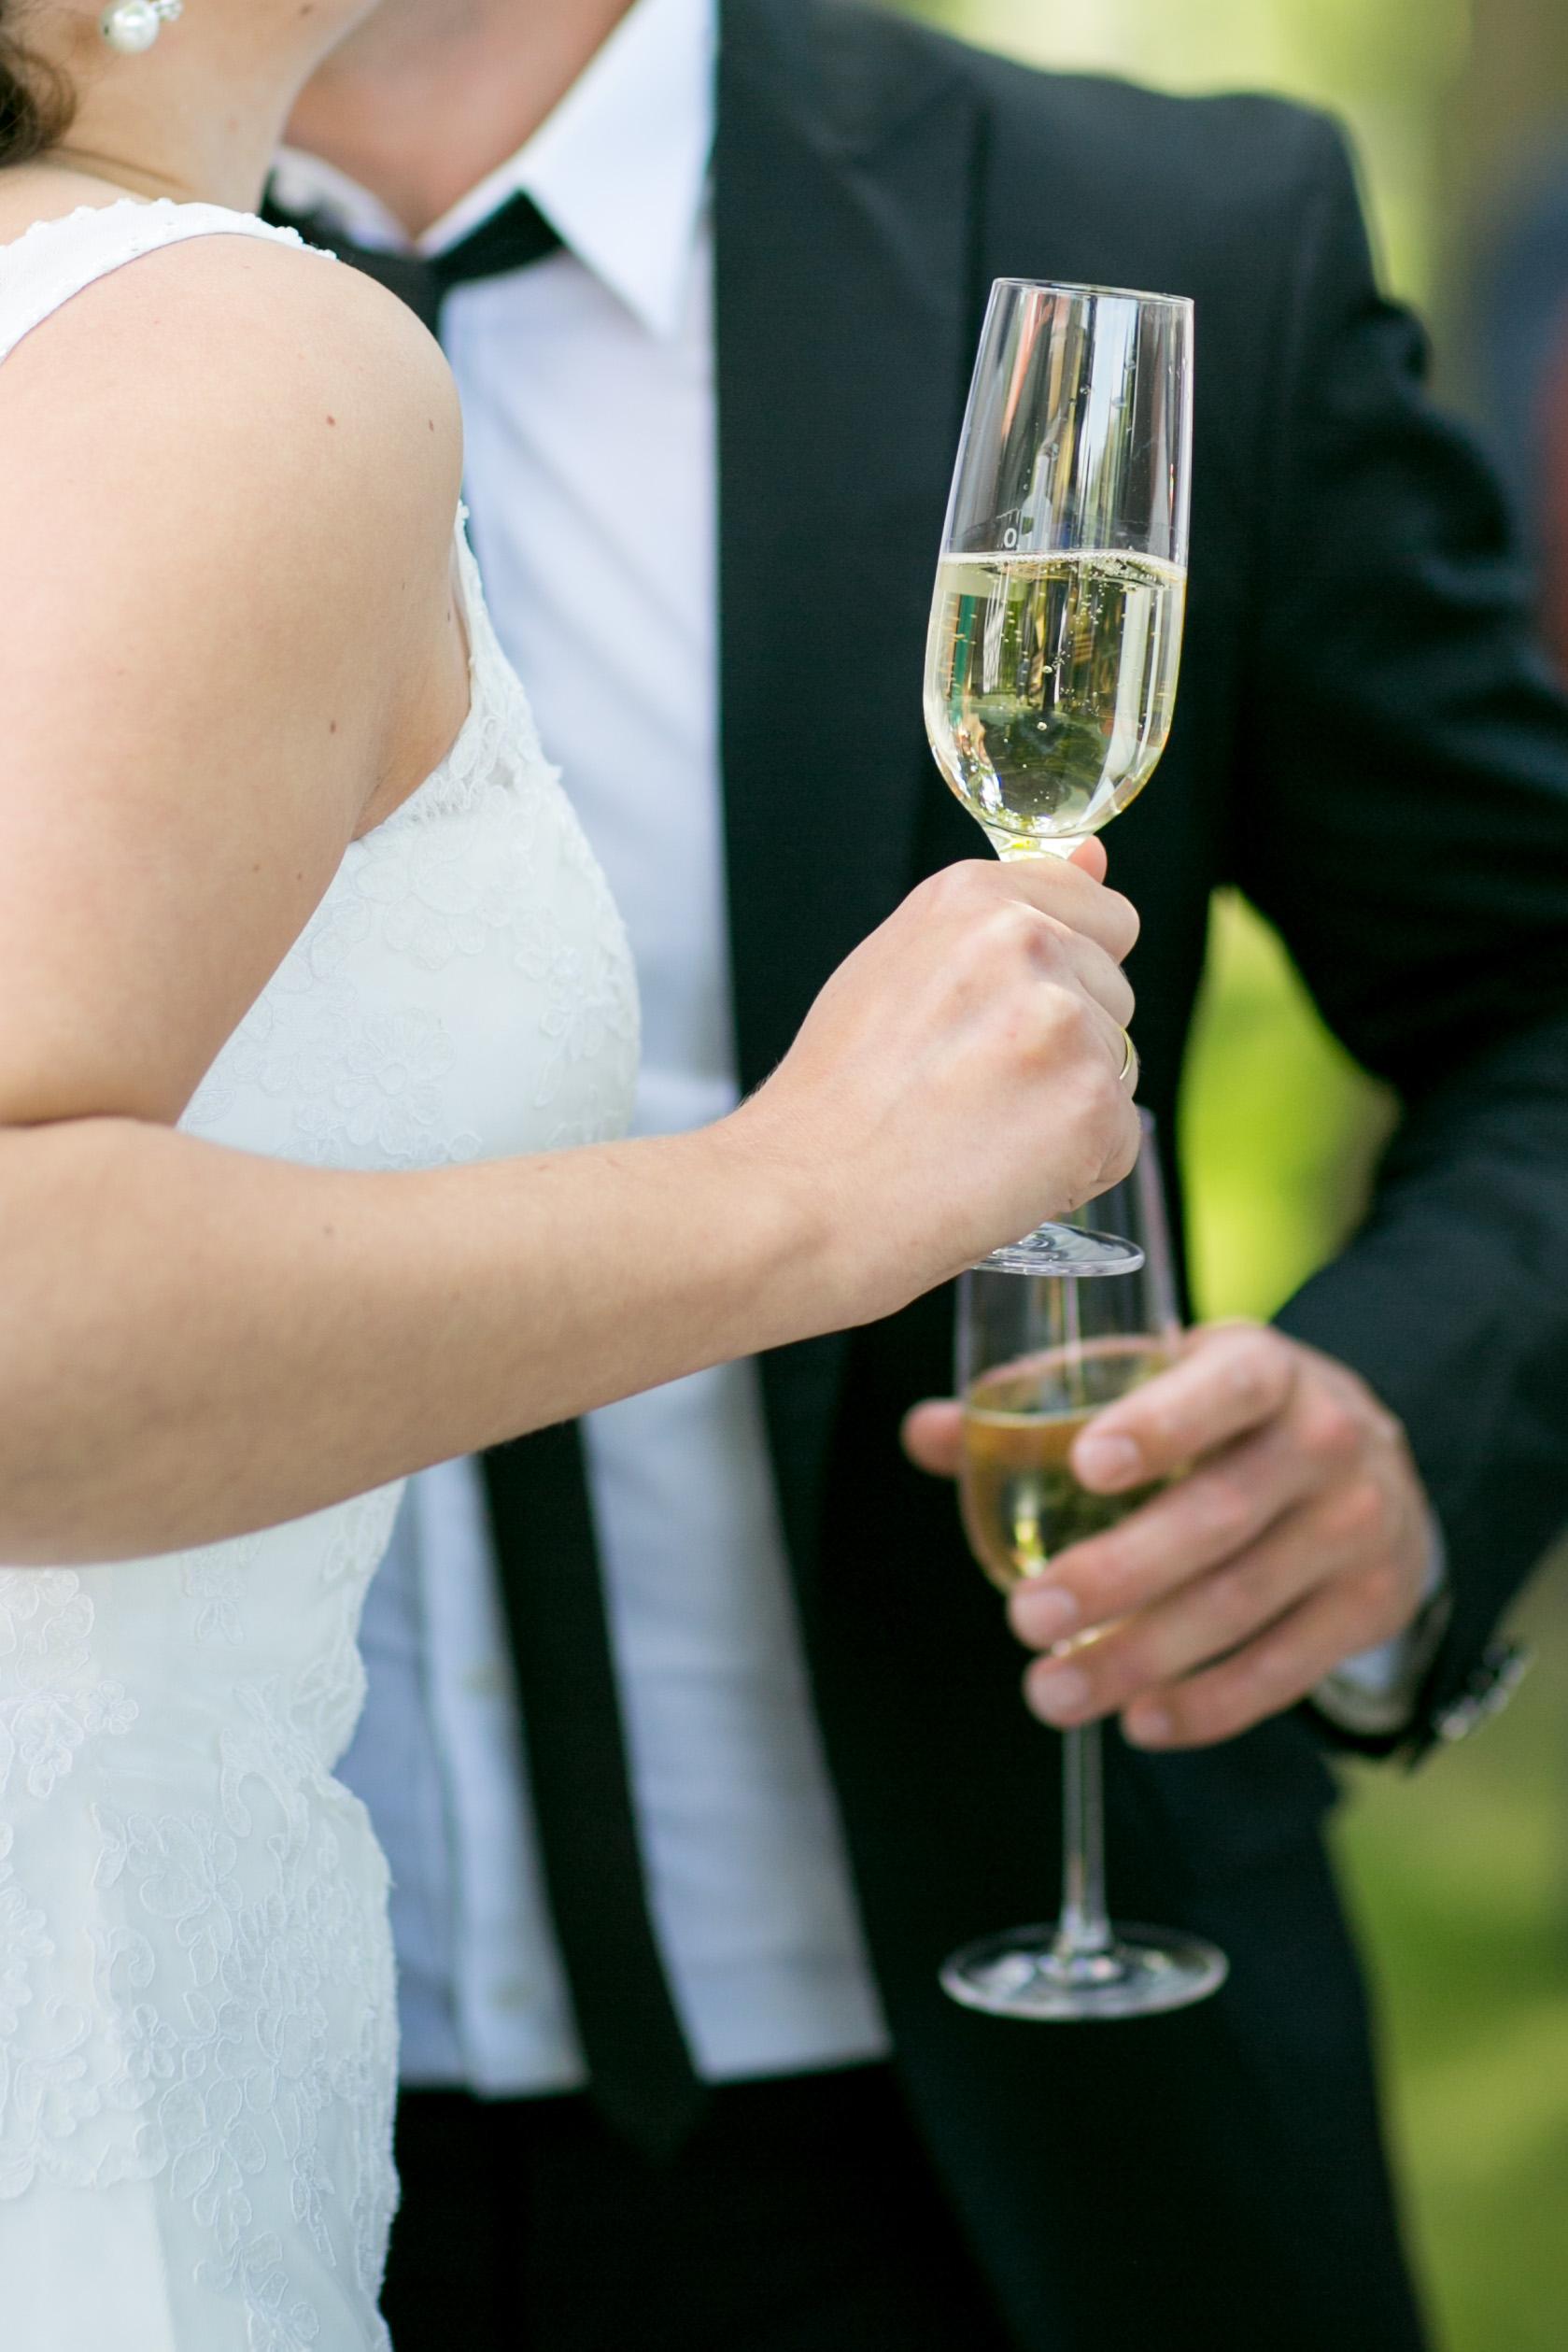 Hochzeitsfotografie Berlin_Fran Burrows Fotografie-57.jpg